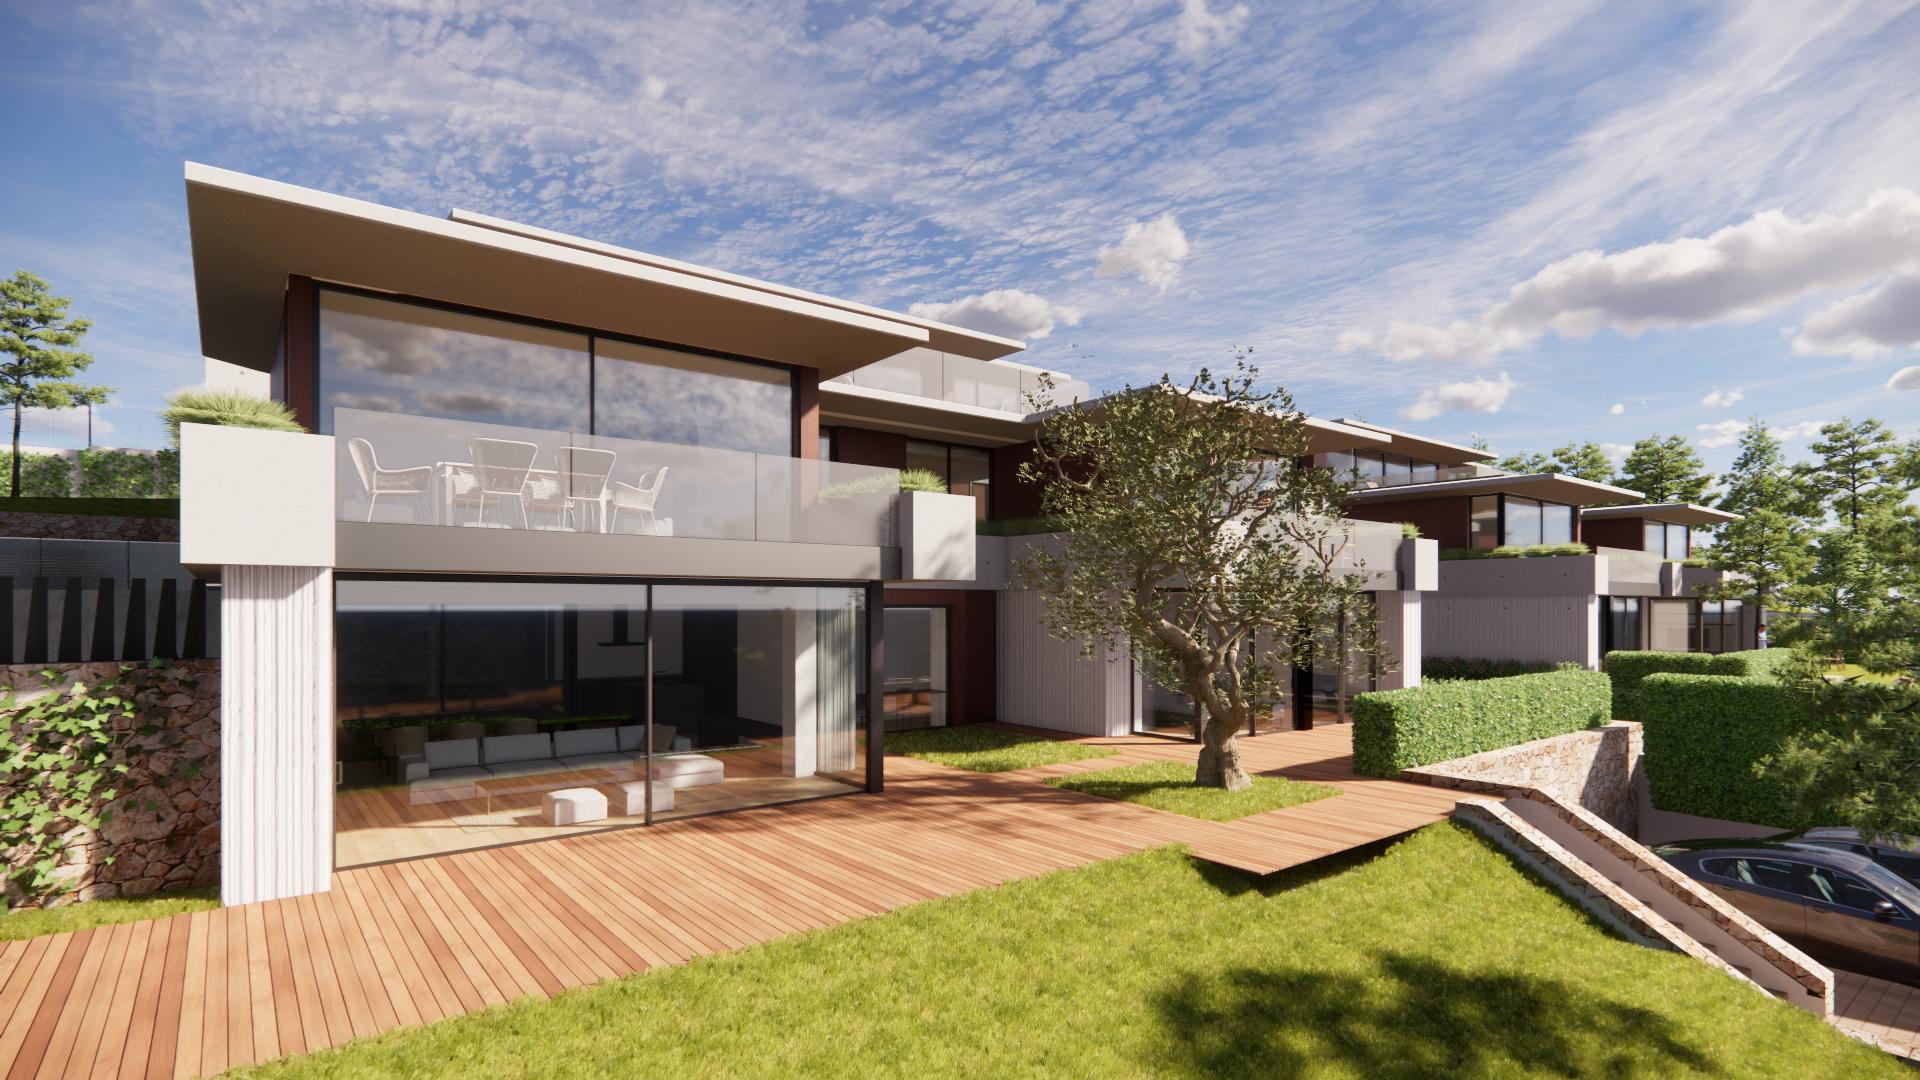 Residential complex Mas de Palol in Playa d'Aro